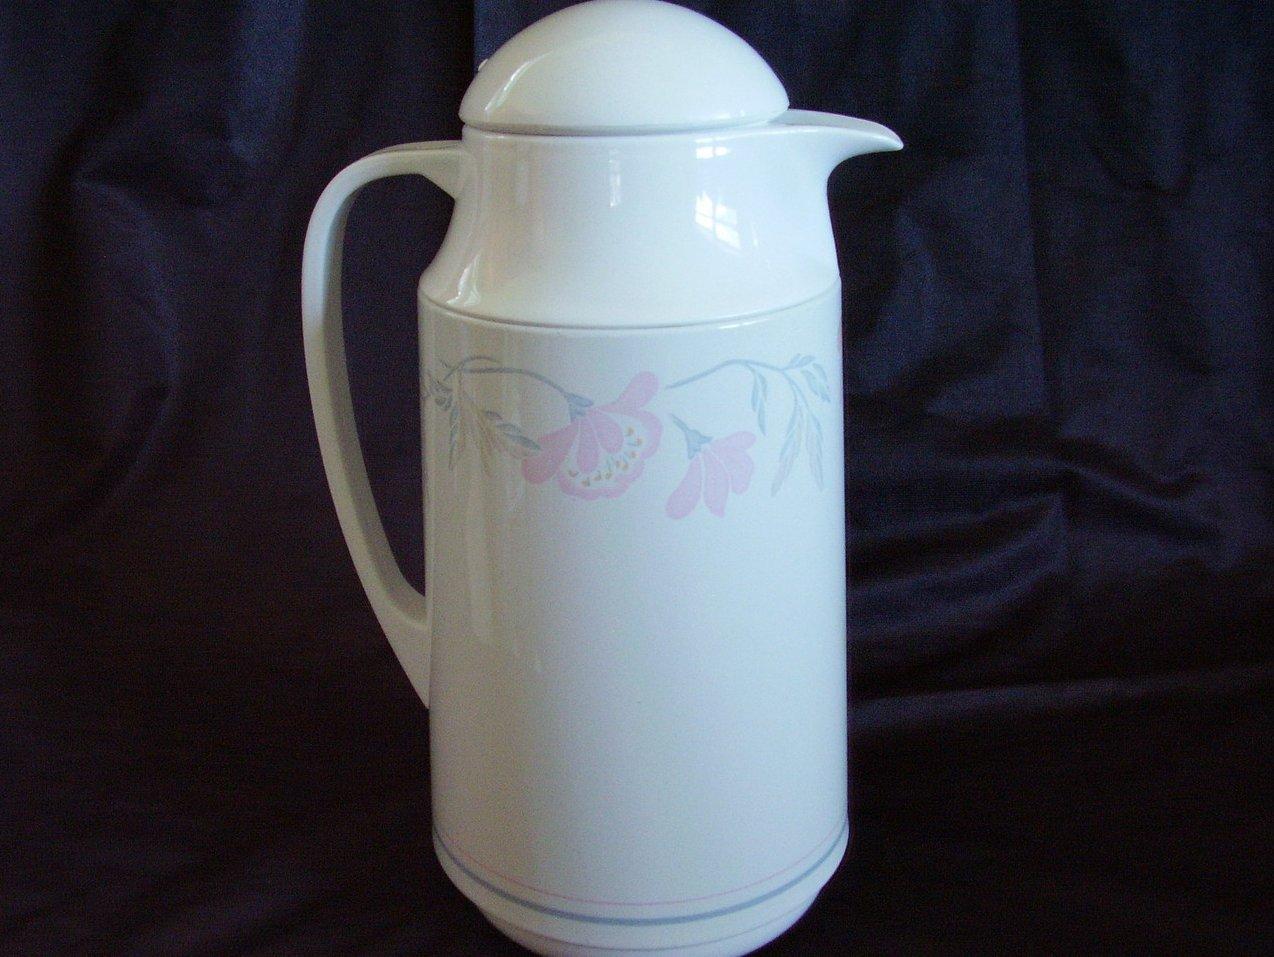 Corningware Corelle Thermique Pink Trio Insulated Carafe